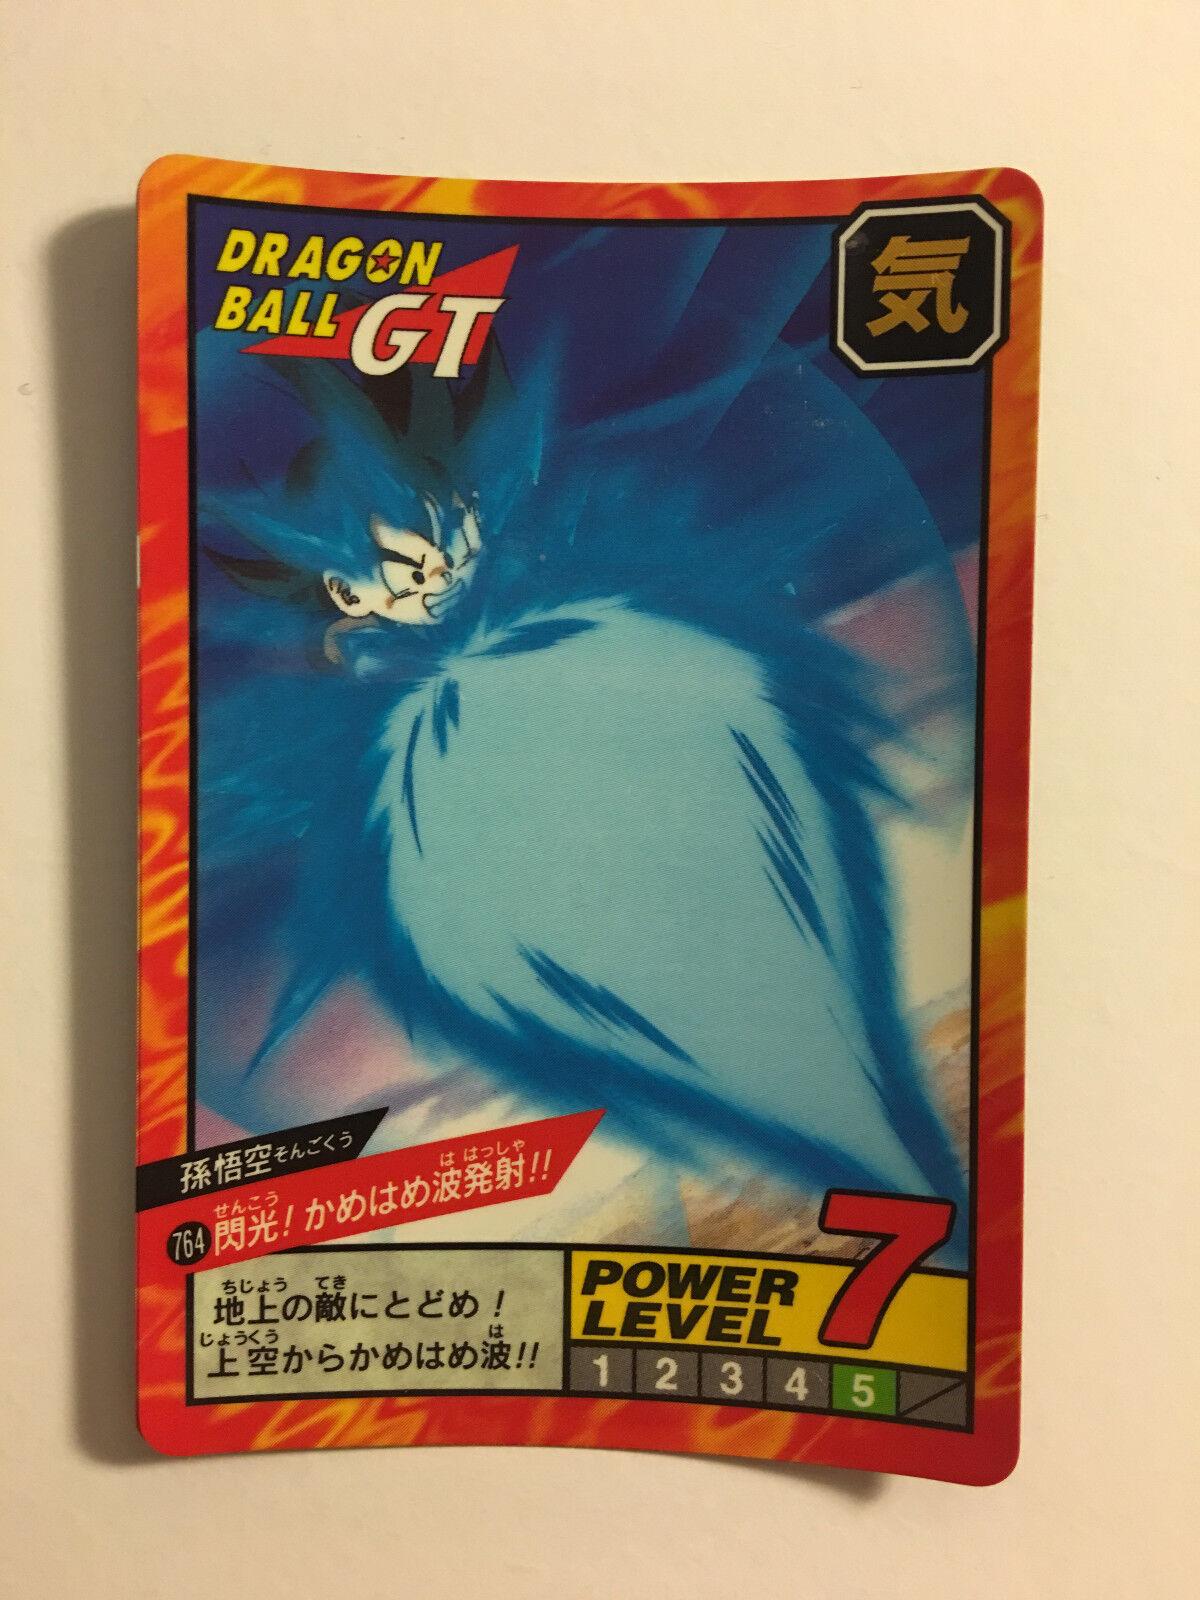 Dragon ball z super kampf macht ebene prisma 764 gesicht